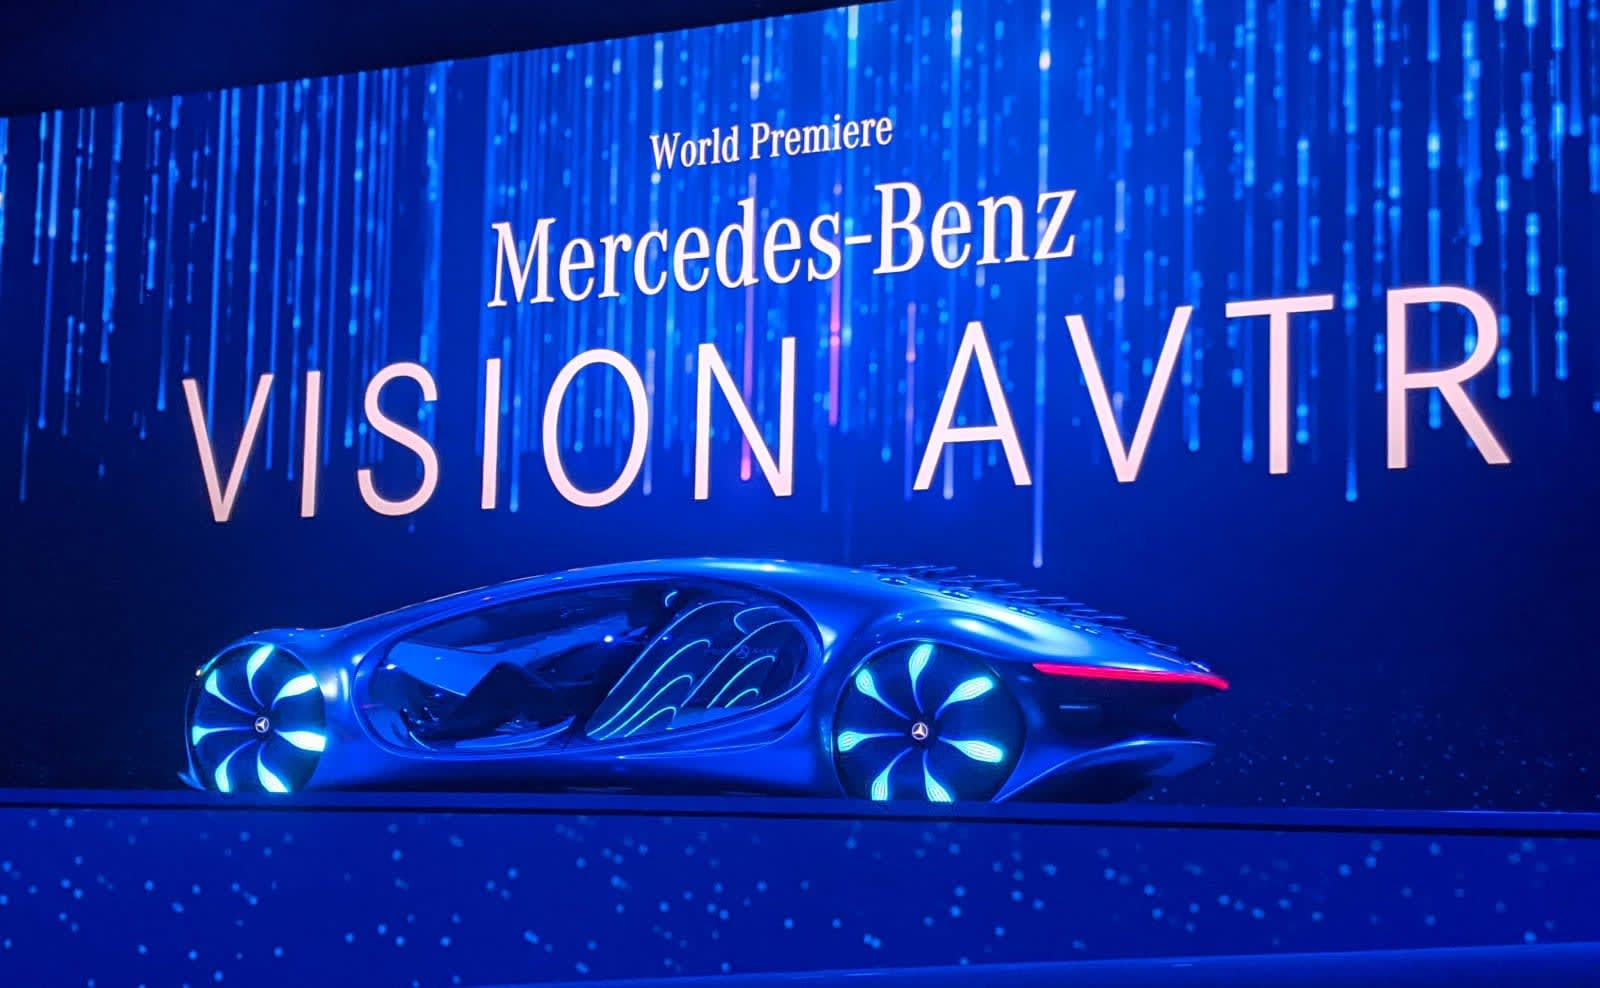 Mercedes unveils crazy Avatar-inspired concept car